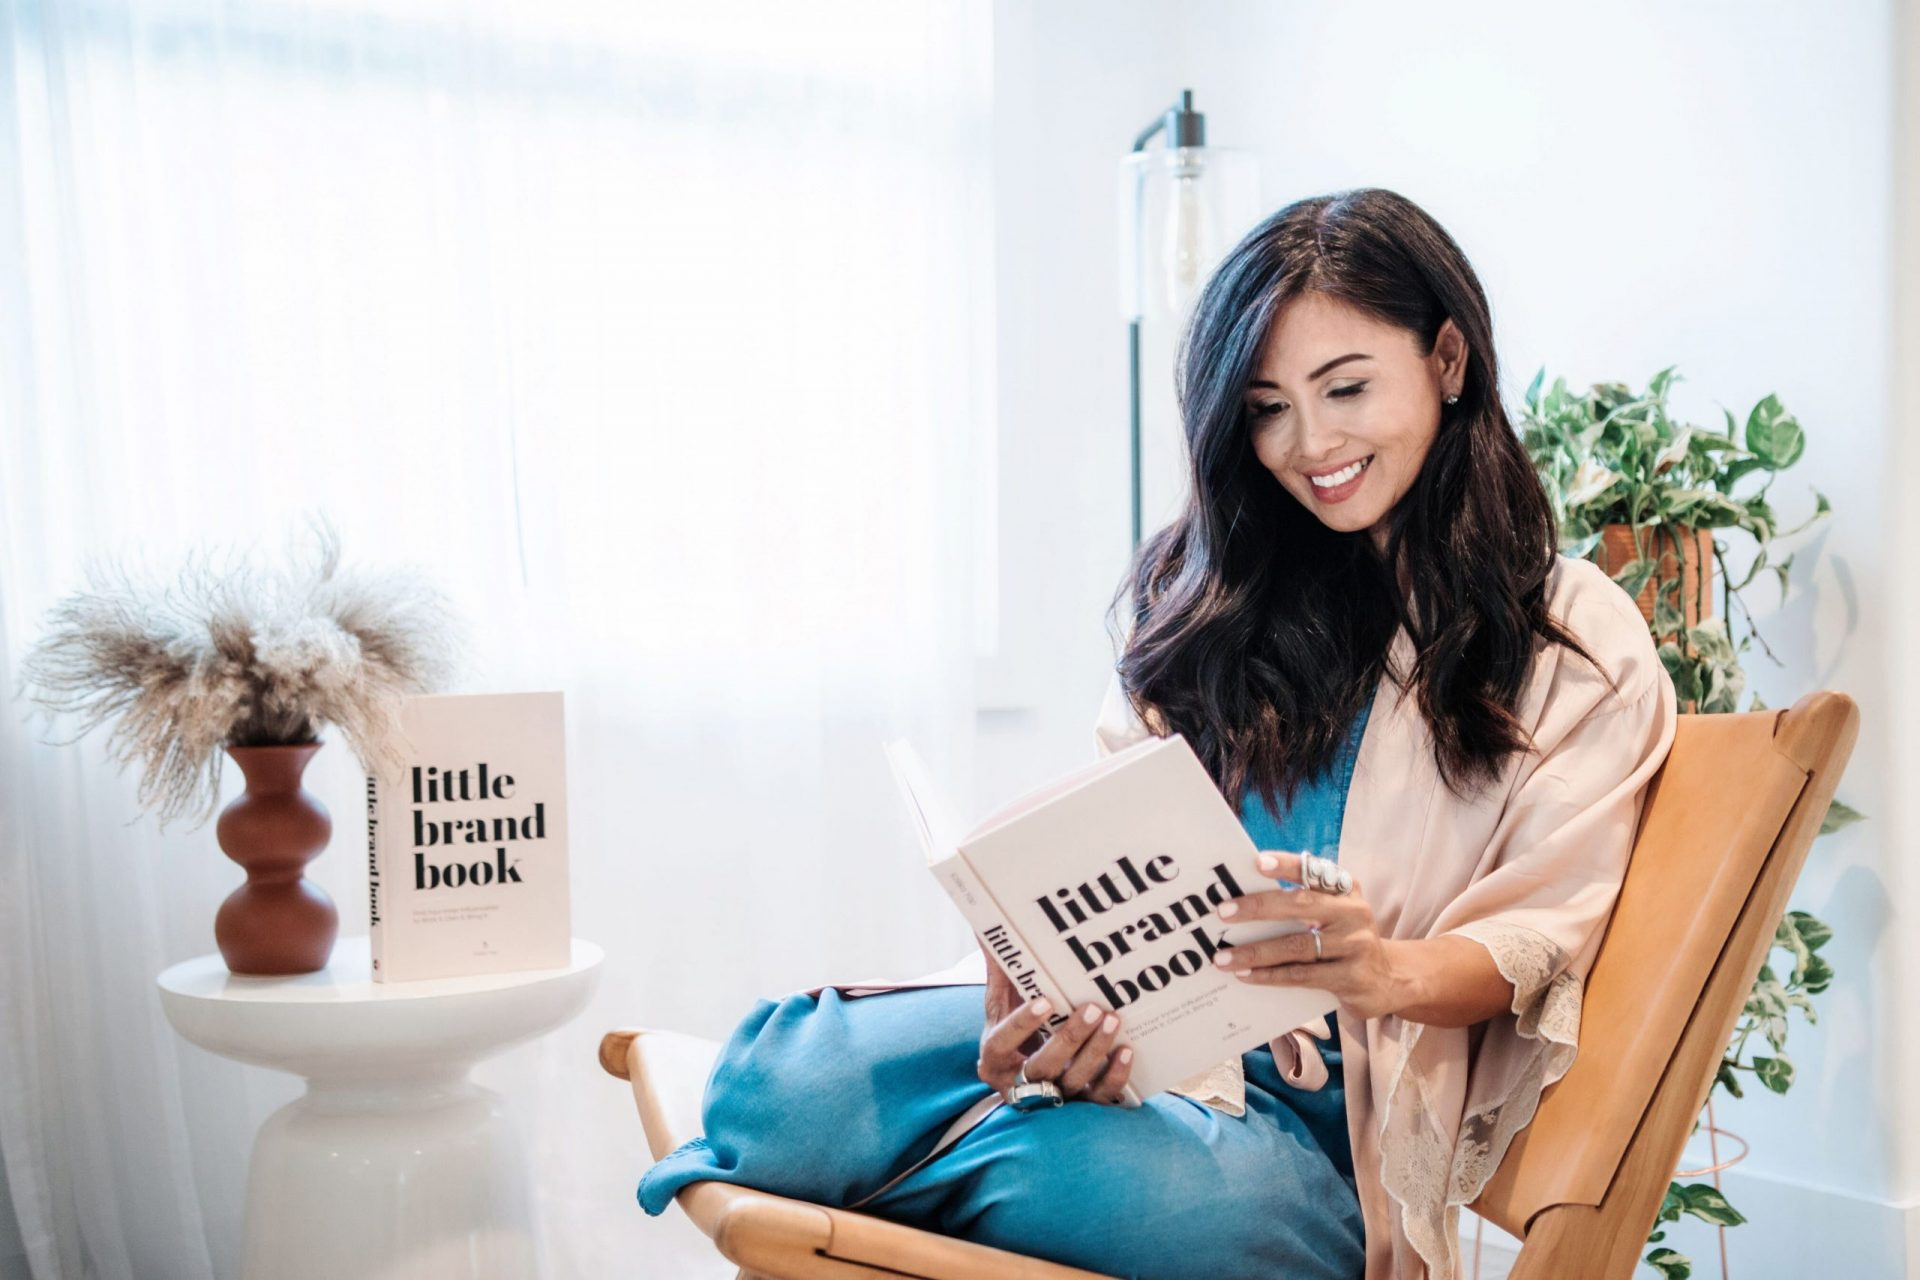 Kalika Yap reading little brand book for kalika.com headshot photoshoot